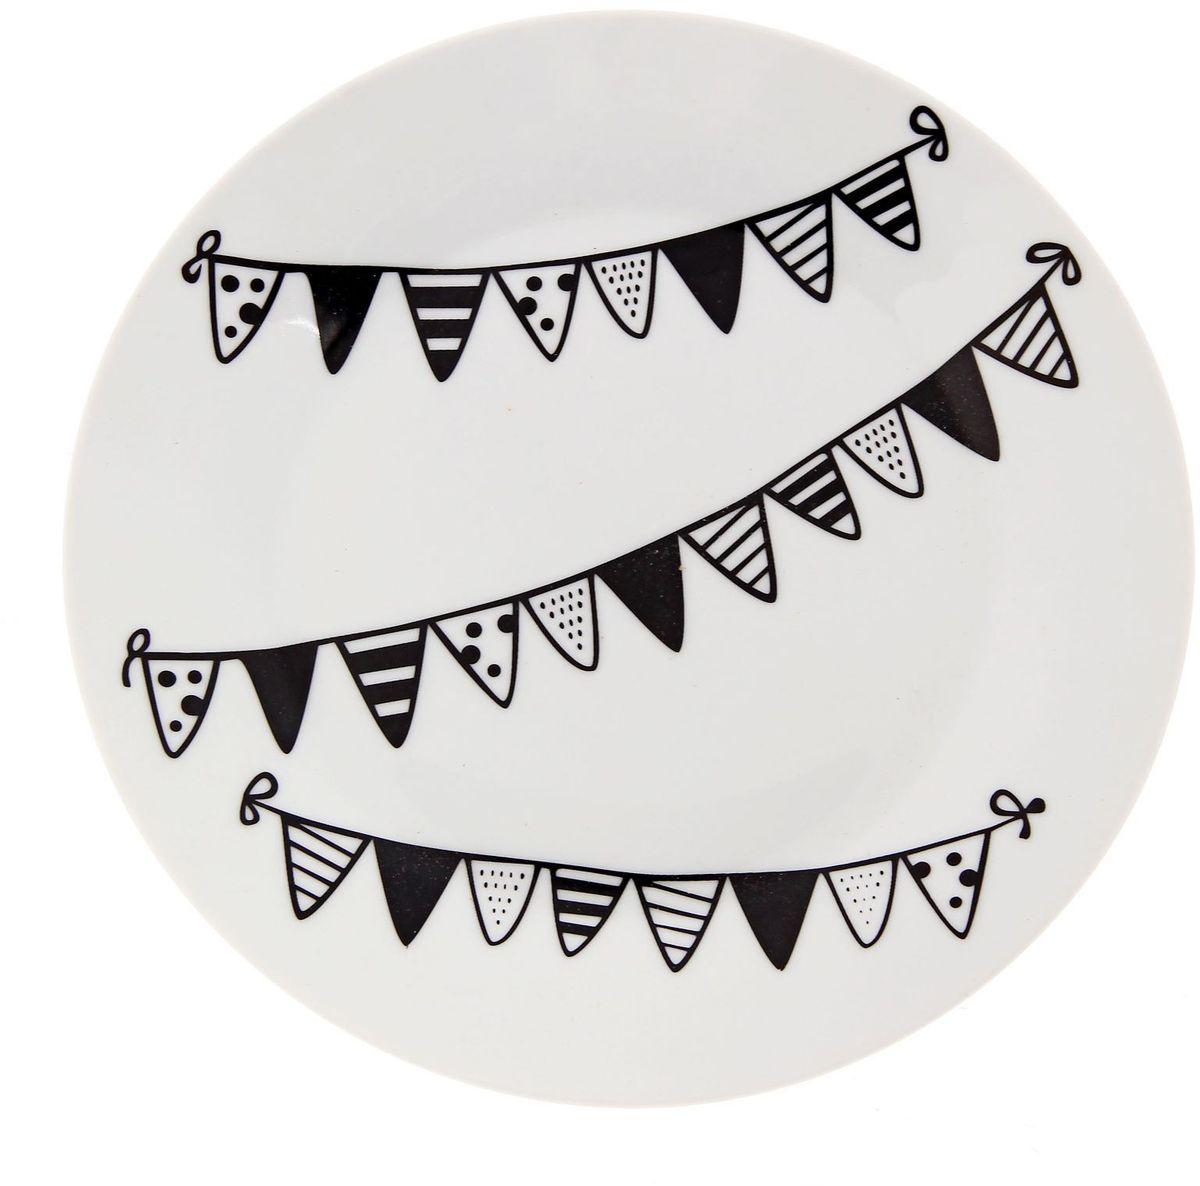 Тарелка мелкая Сотвори чудо Флажки, диаметр 20 см тарелка мелкая сотвори чудо полярный мишка диаметр 20 см